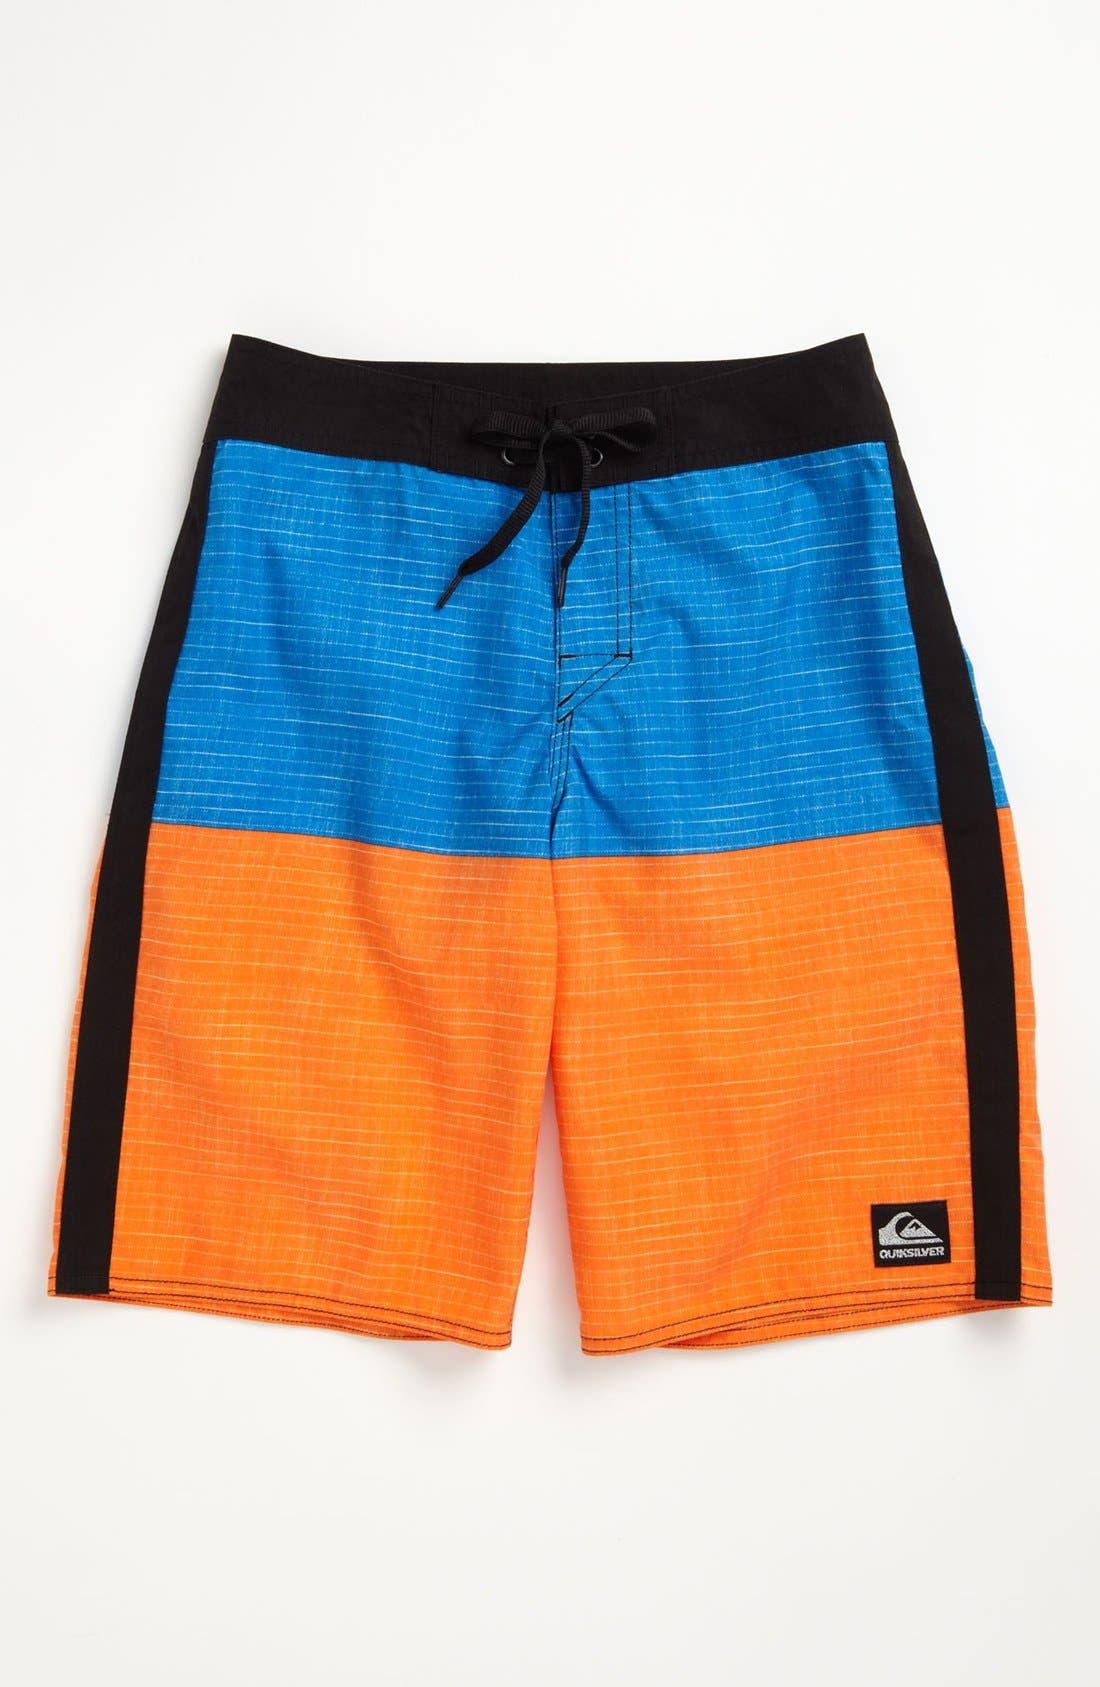 Main Image - Quiksilver Colorblock Board Shorts (Big Boys)